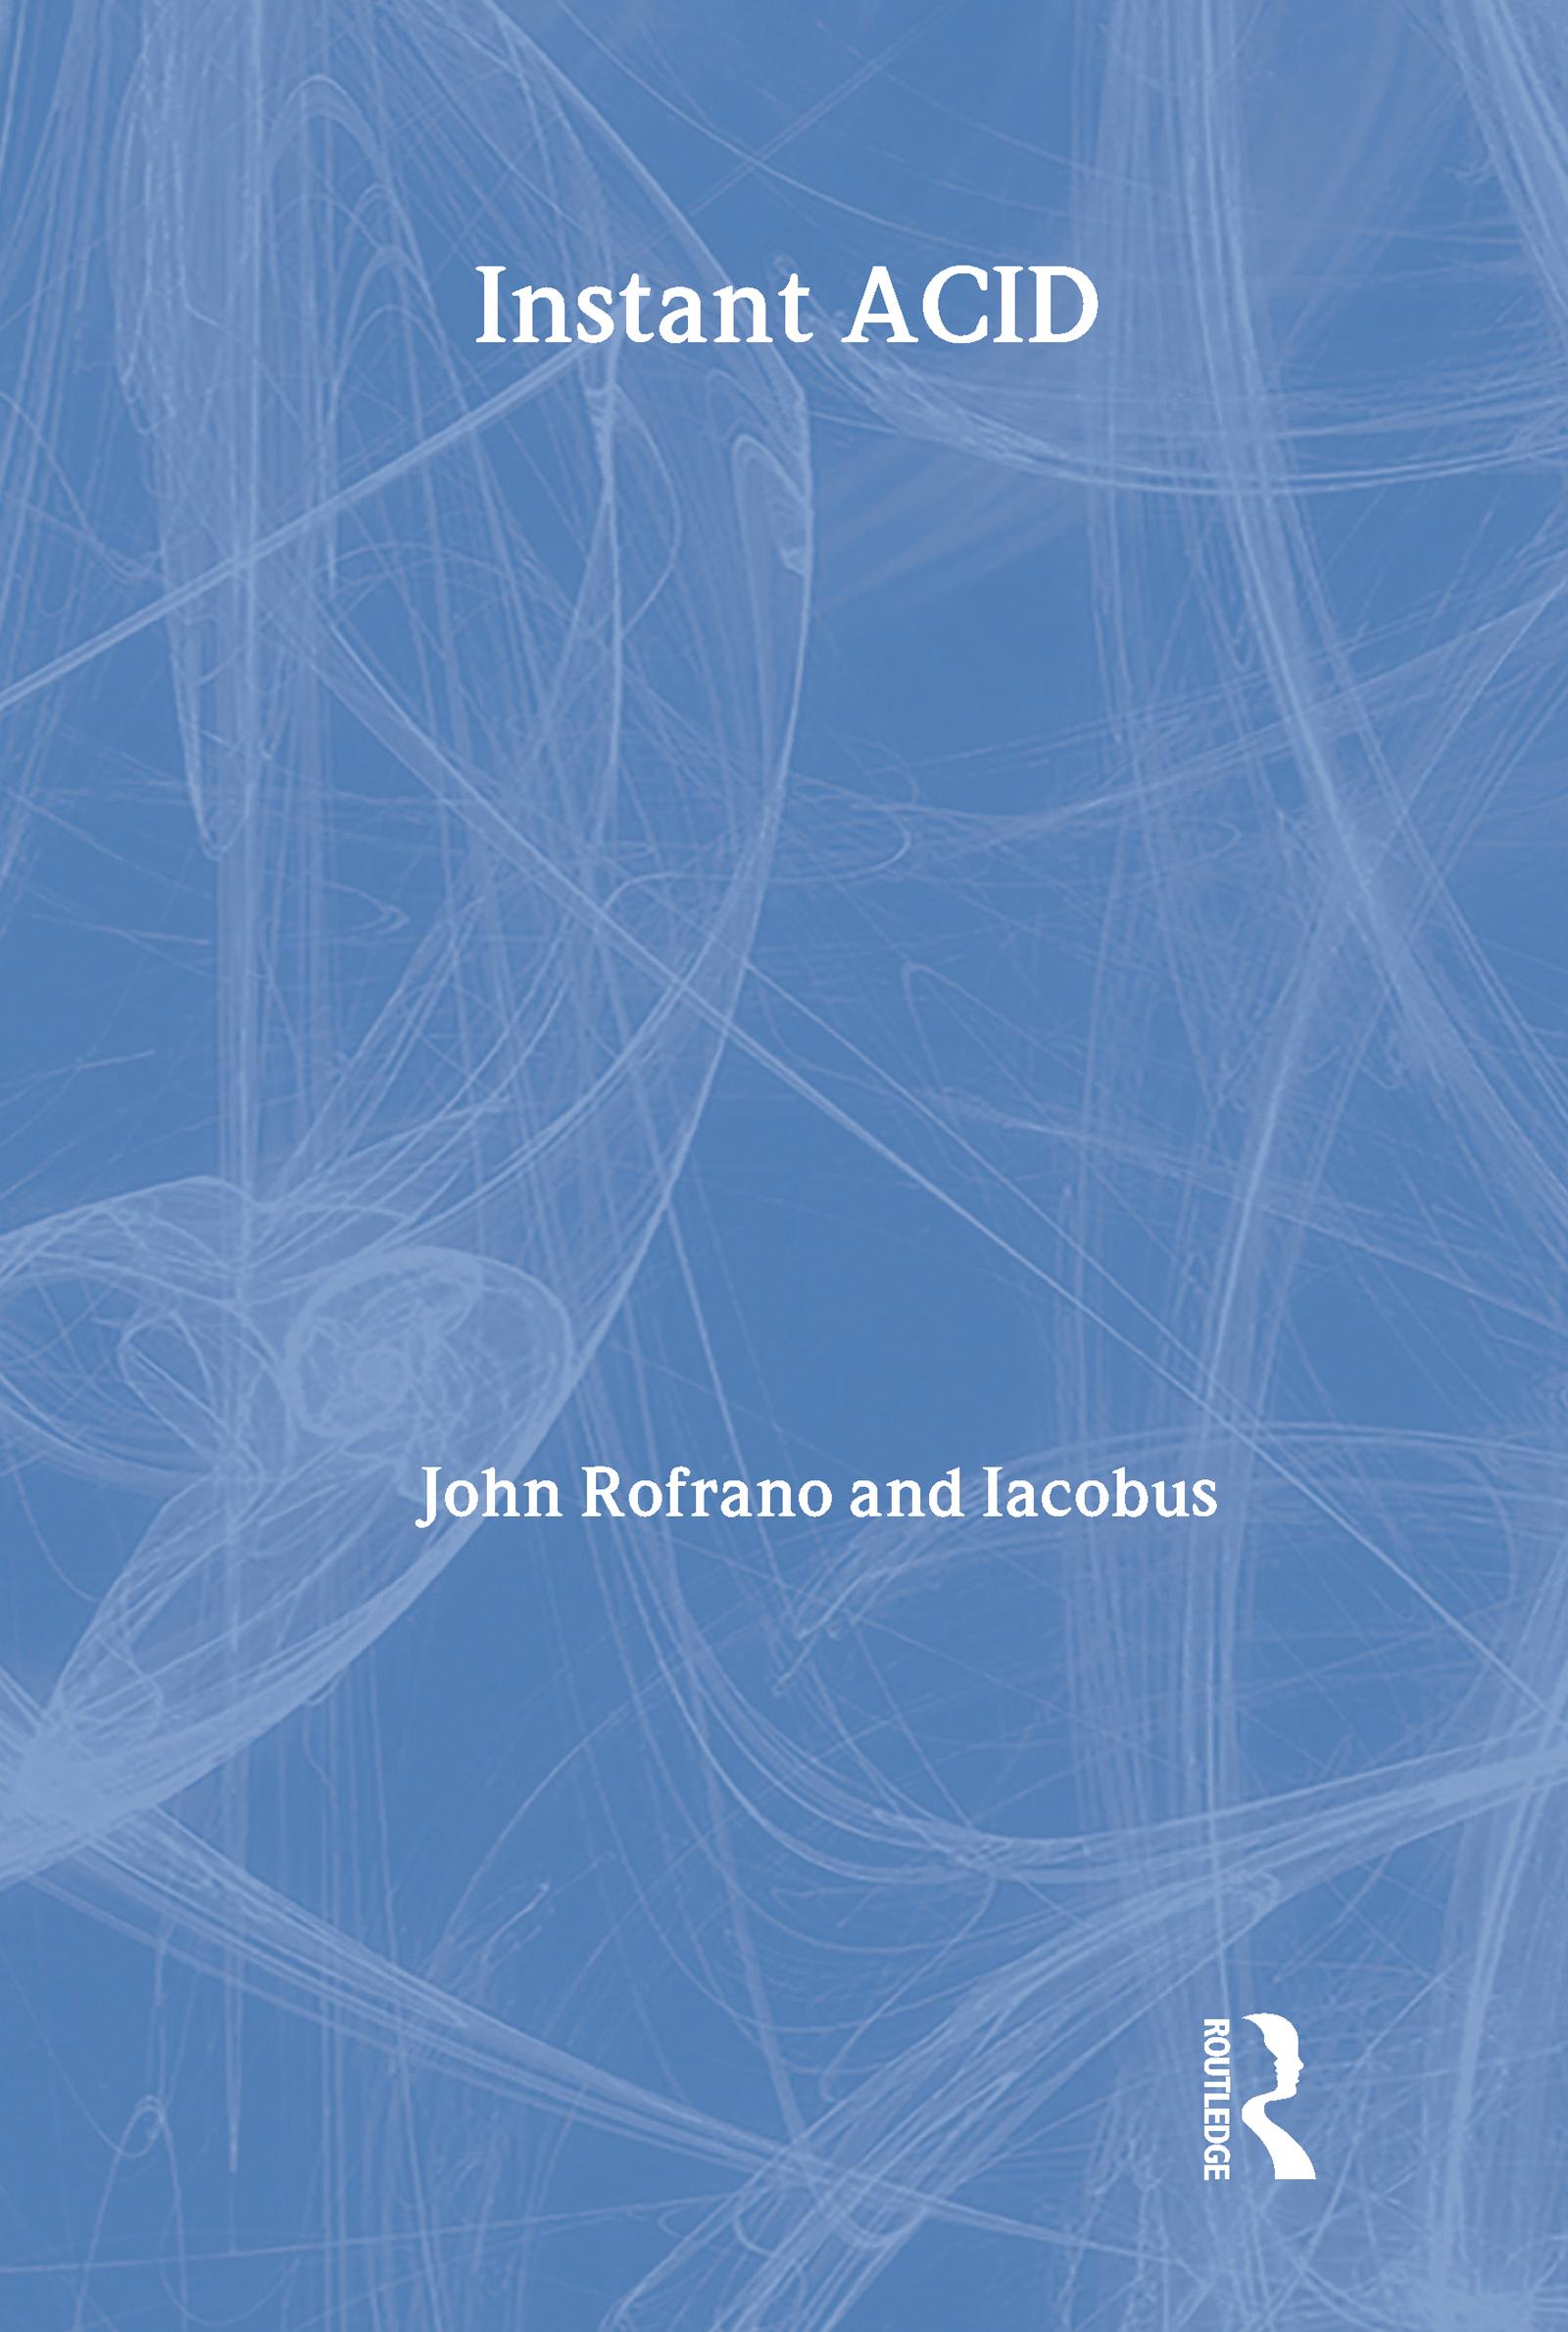 Instant ACID: VASST Instant Series, 1st Edition (Paperback) book cover